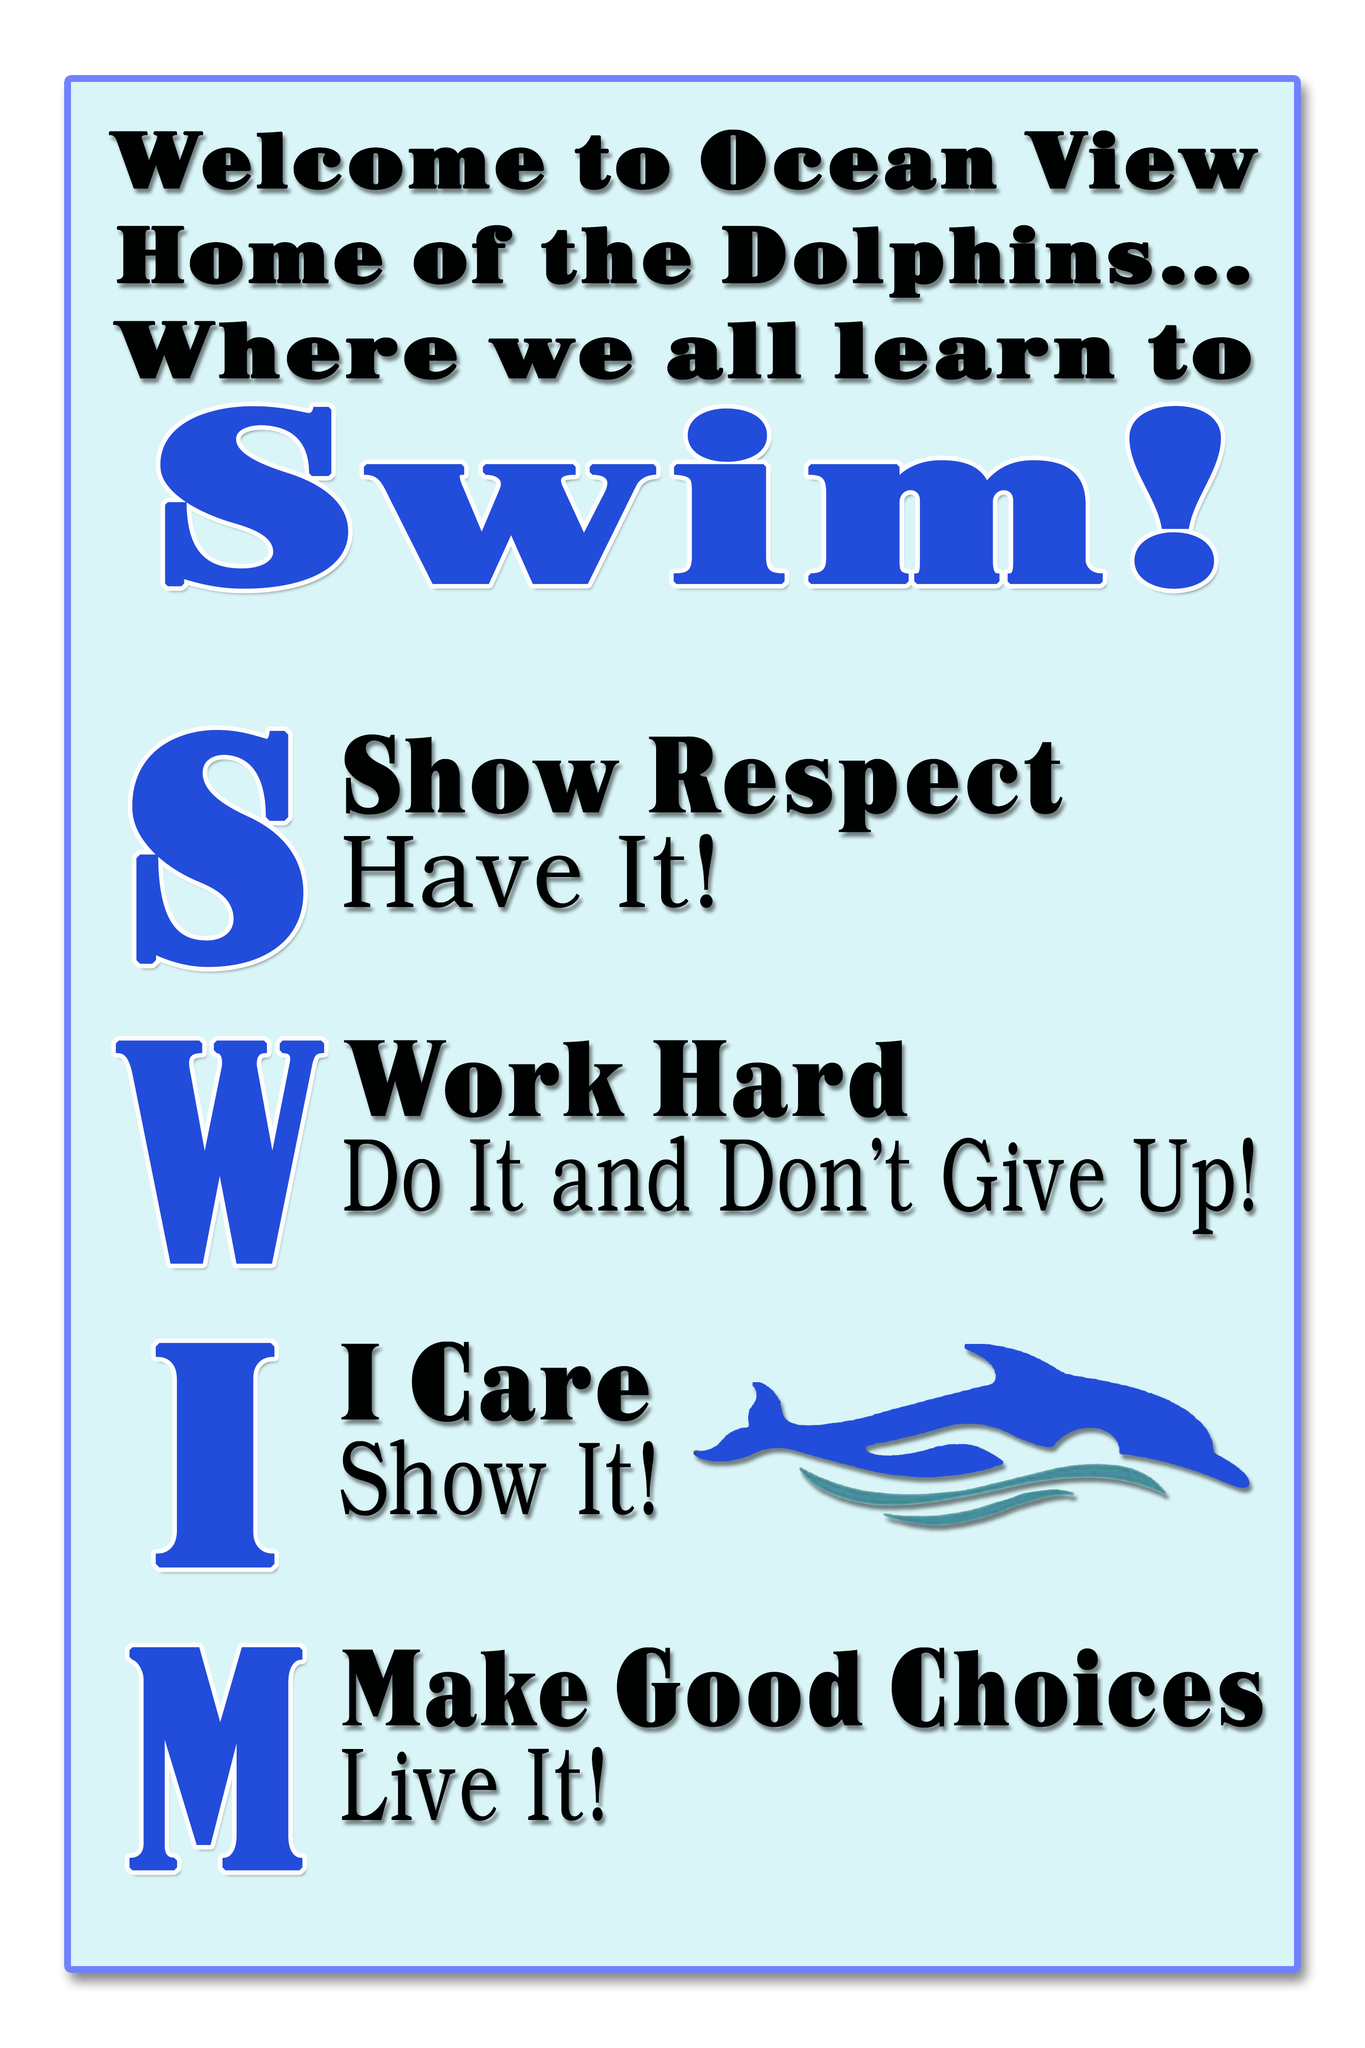 SWIM!  Show Respect, Work Hard, I care, Make good choices